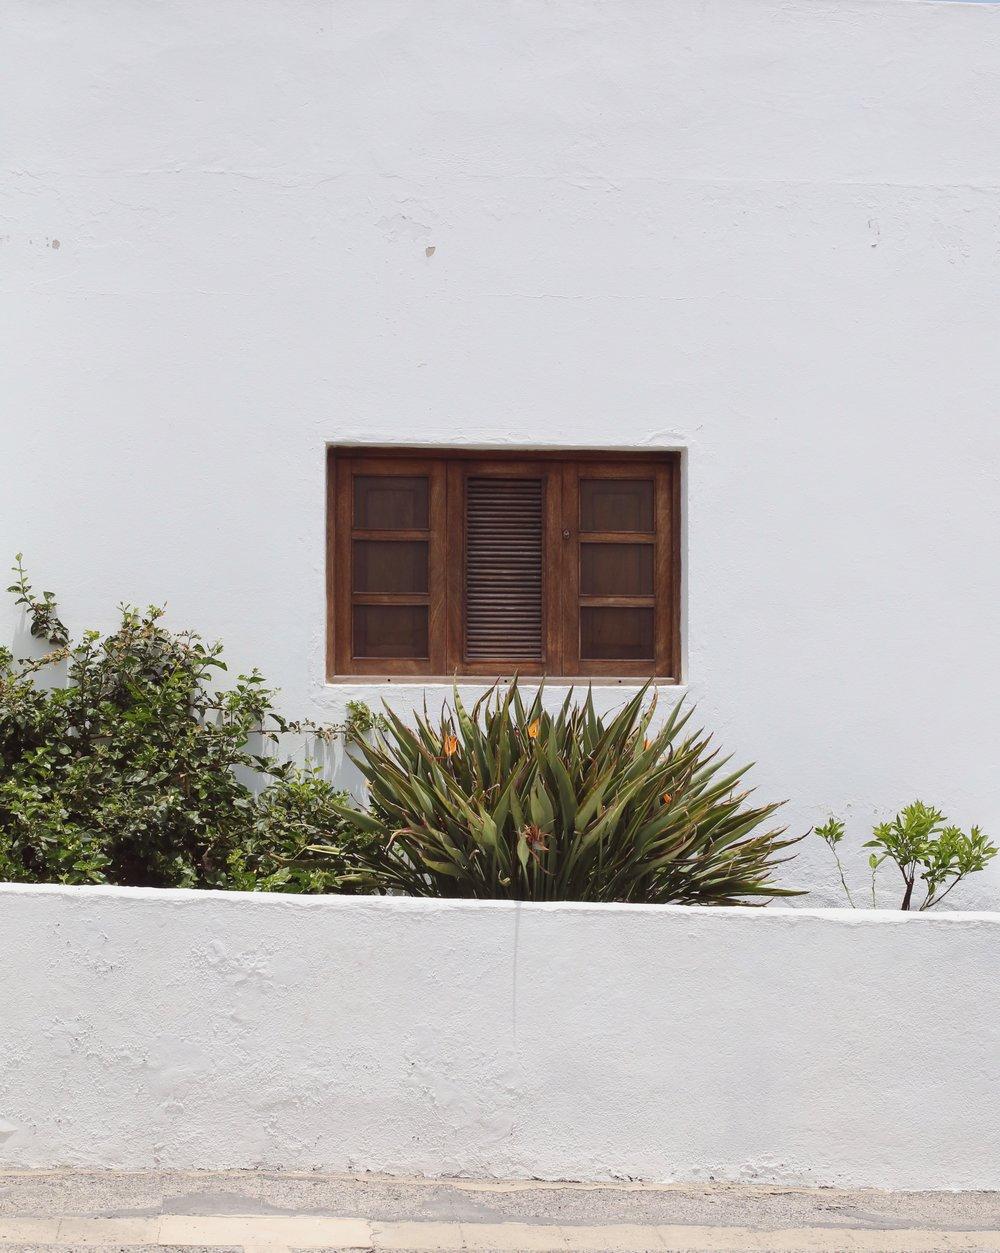 Lanzarote - Hannah Gabrielle More Travel Photography